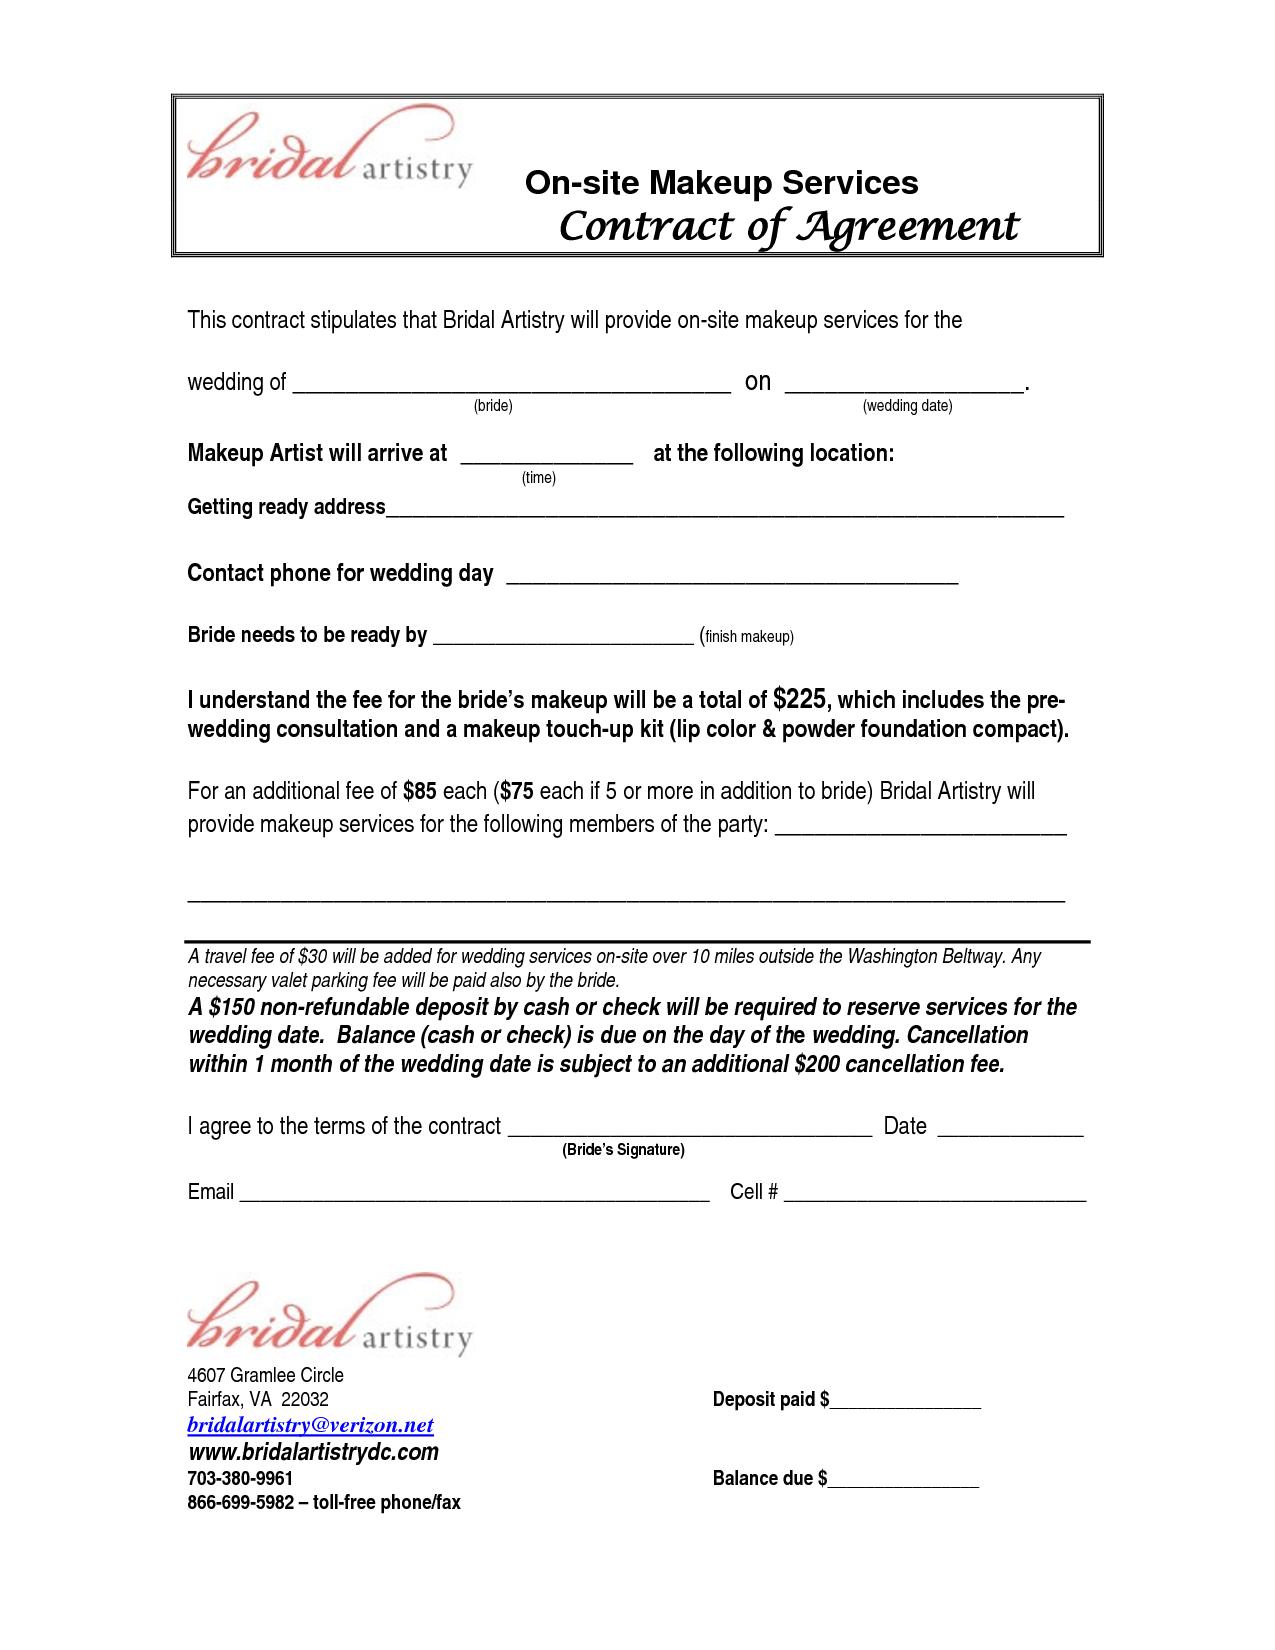 artist contract templates - solarfm.tk